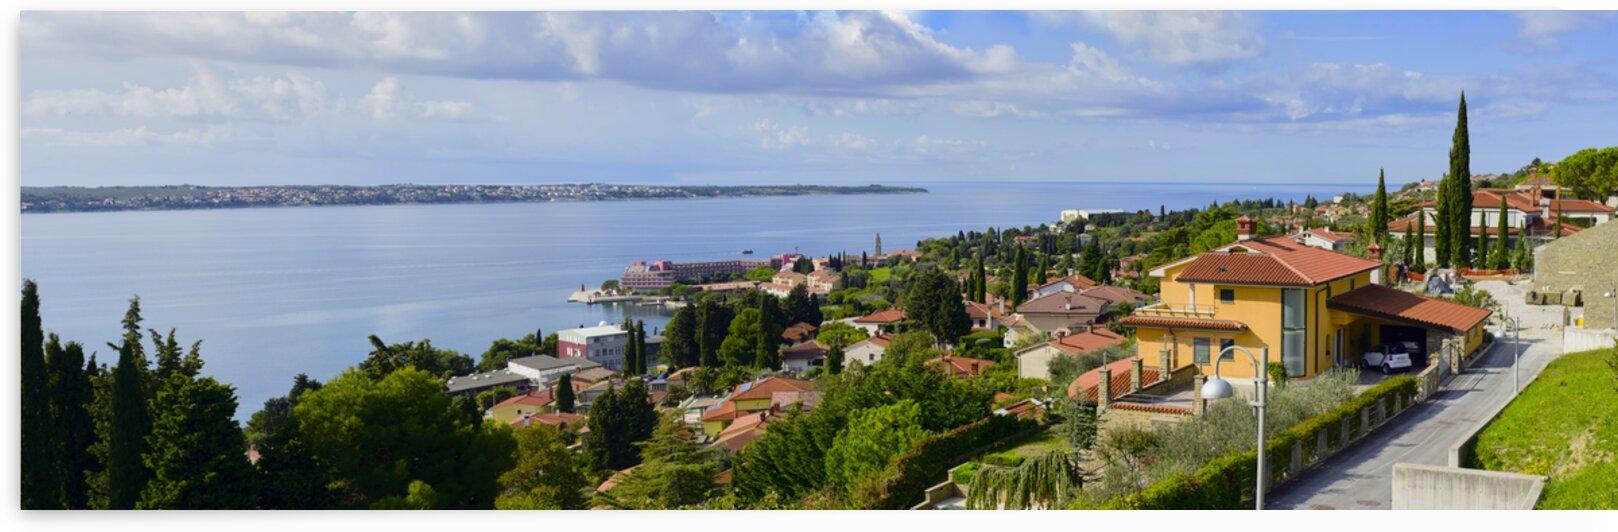 Small resort town on the slovenian adriatic coast Piran Slovenia by Atelier Knox